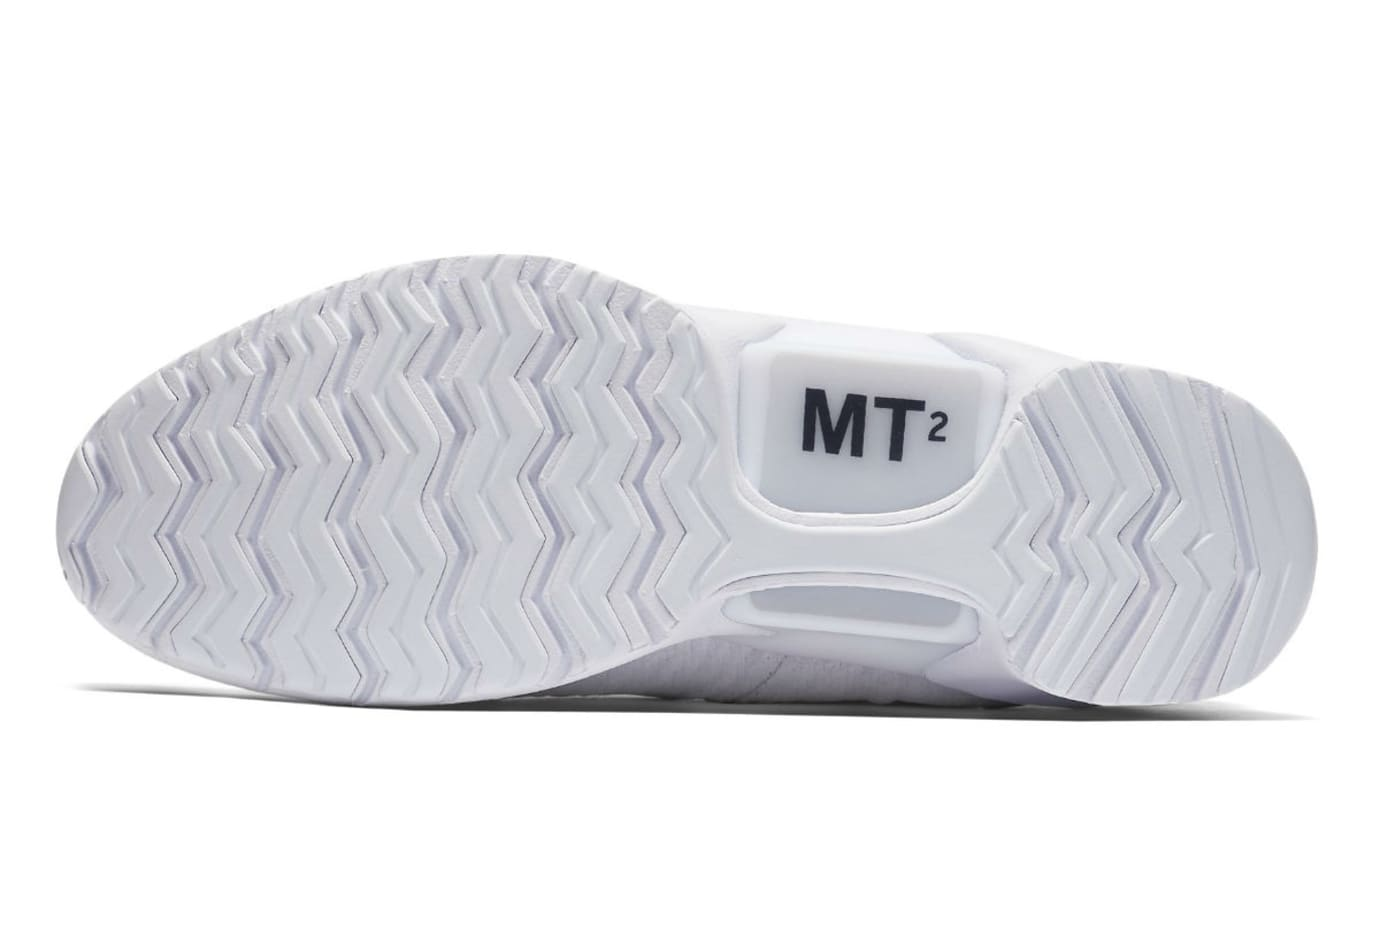 Nike HyperAdapt 1.0 Triple White Release Date AH9389-102 Sole